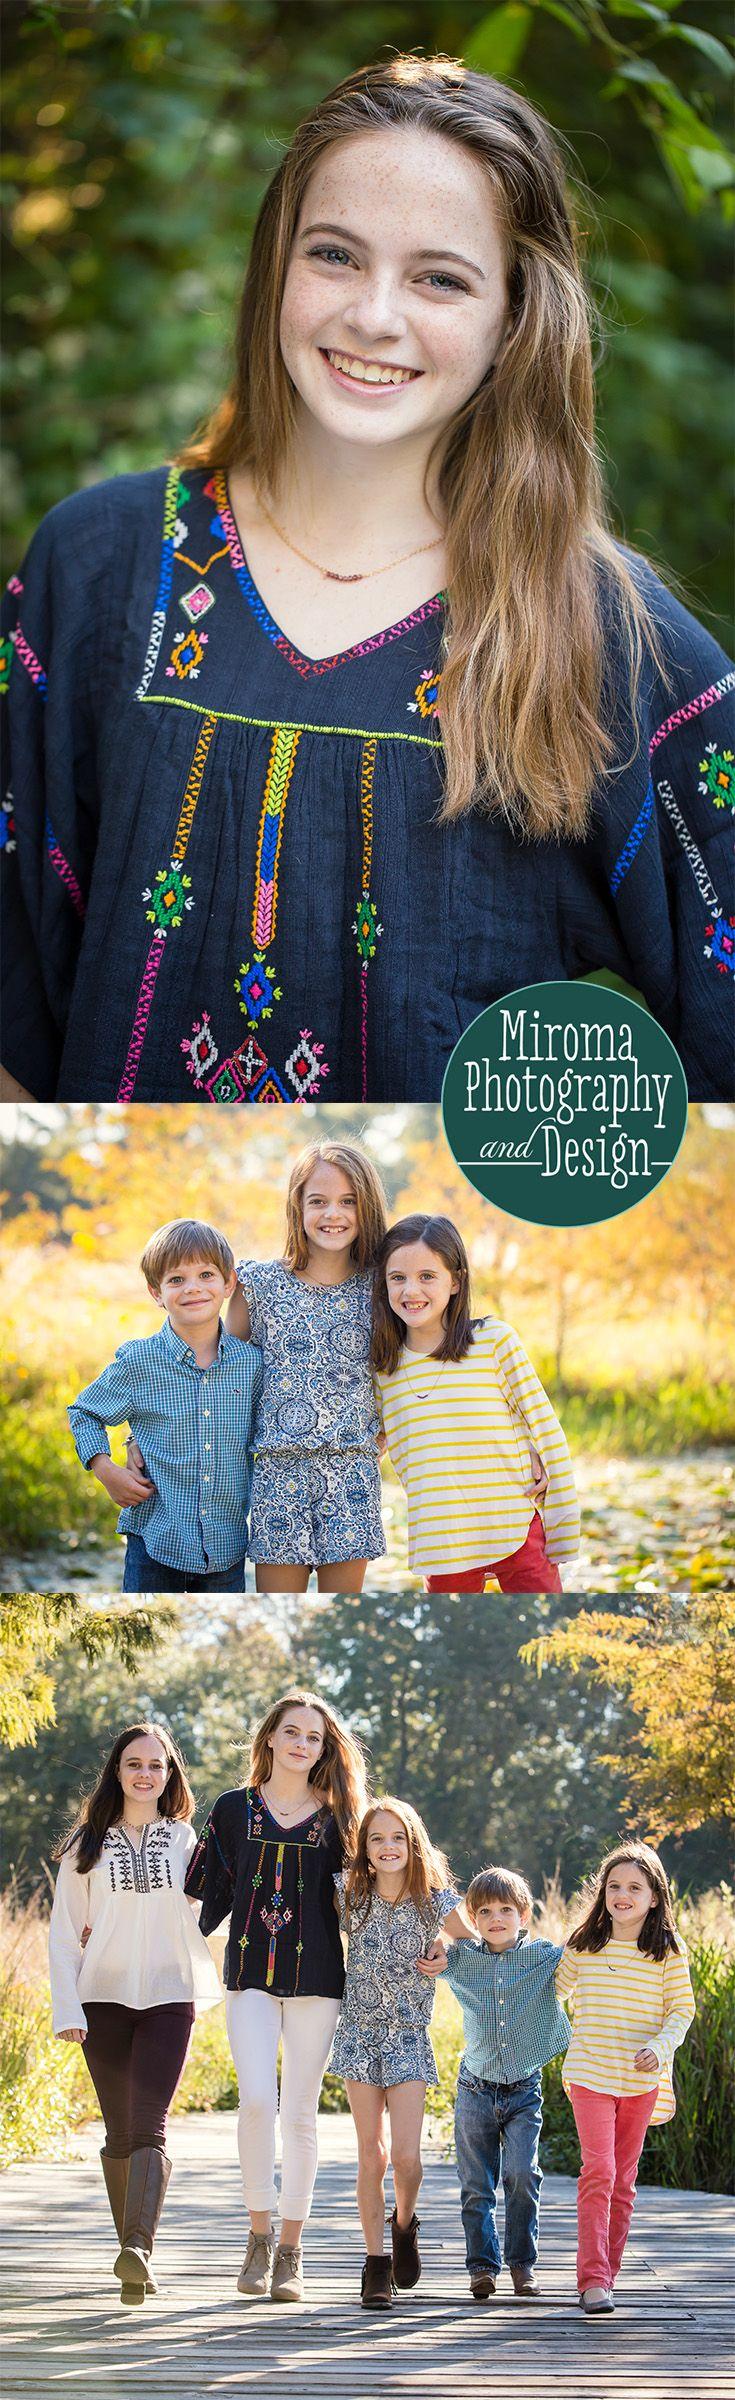 Houston Arboretum, Miroma Photography & Design